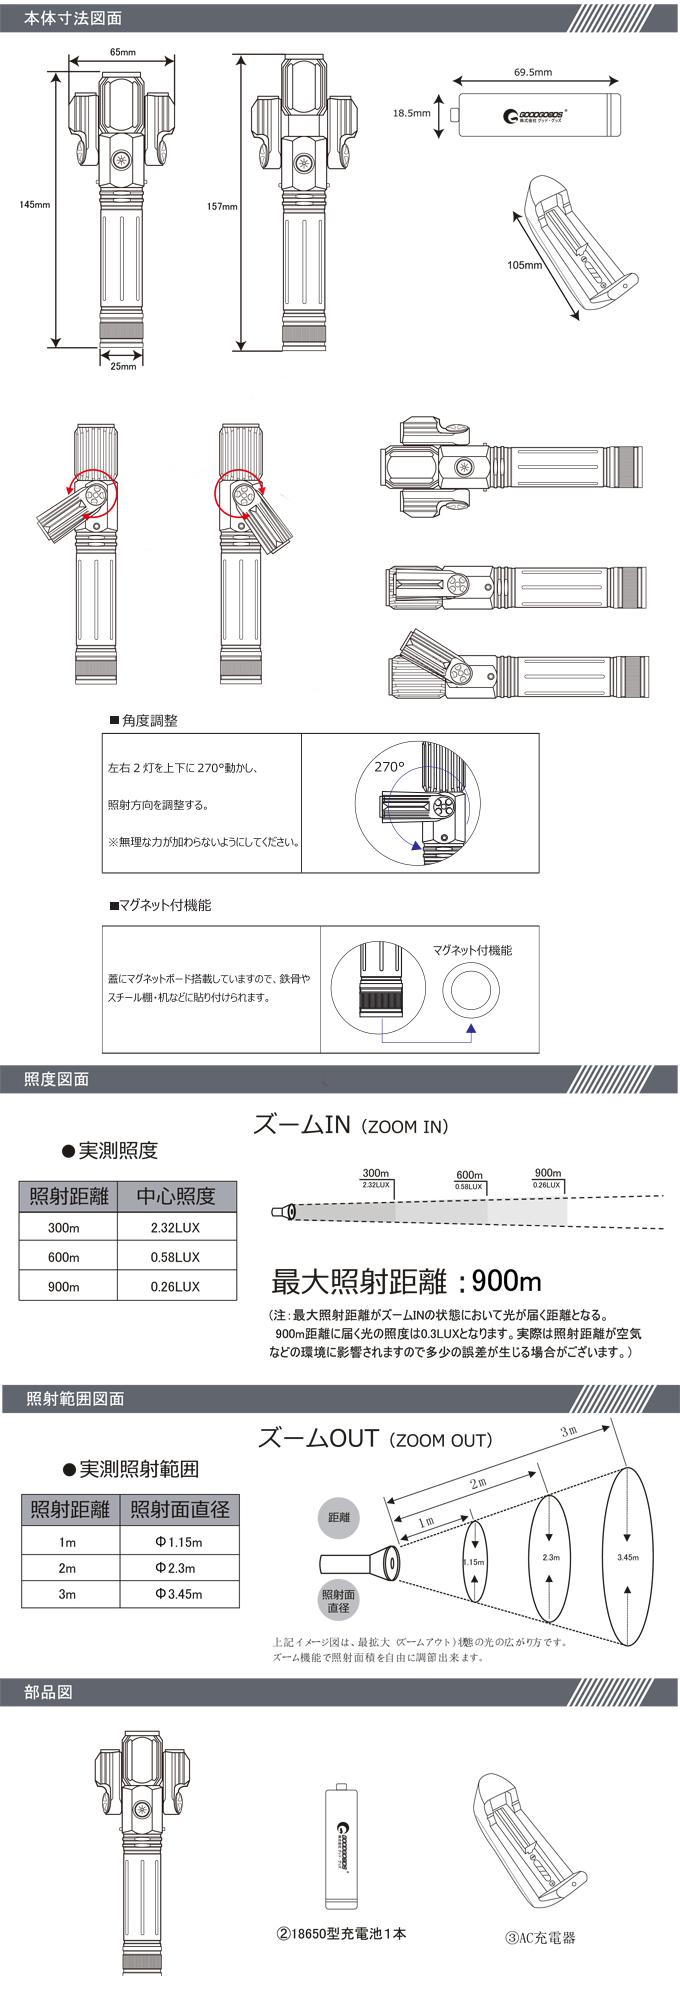 LED 懐中電灯 充電式 CREE XML-T6 3000LM 3灯タイプ 18650電池 4モード 防水 長寿命